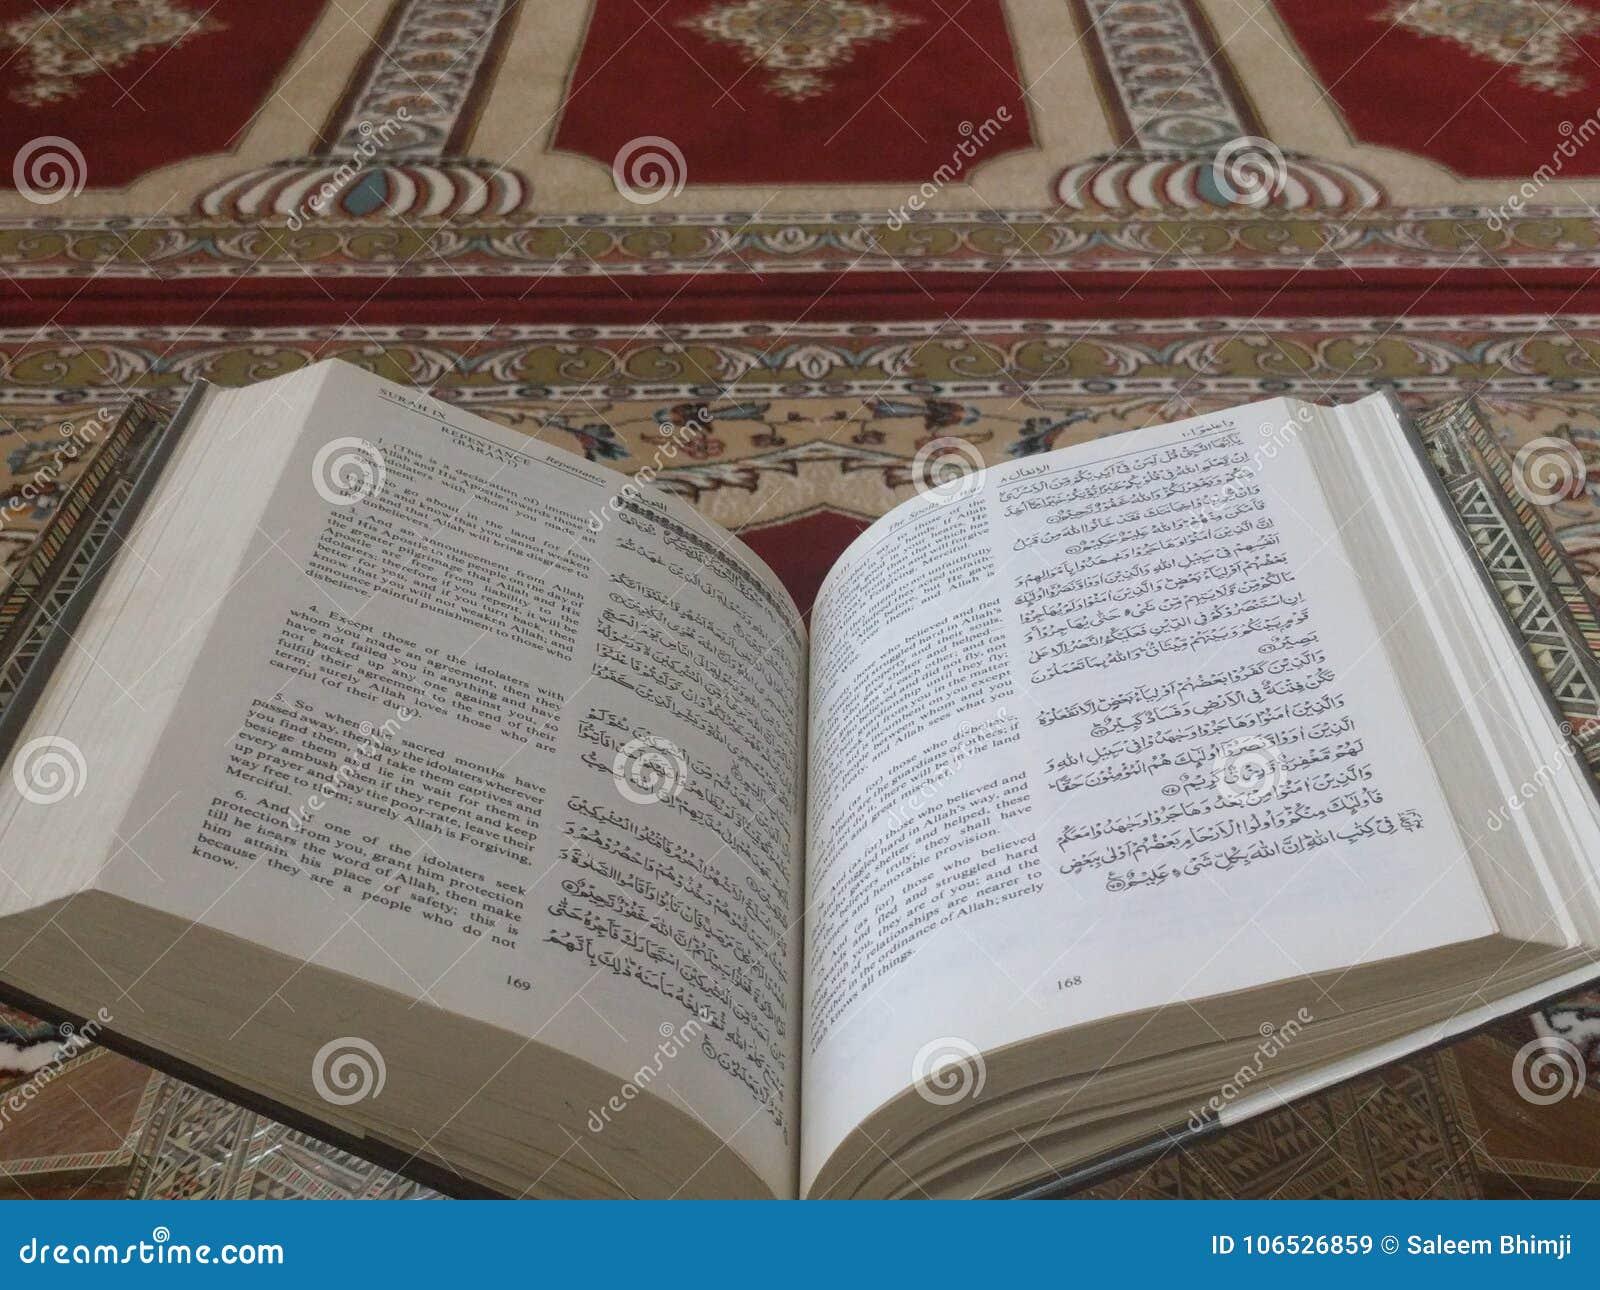 English To Arabic Translation Book